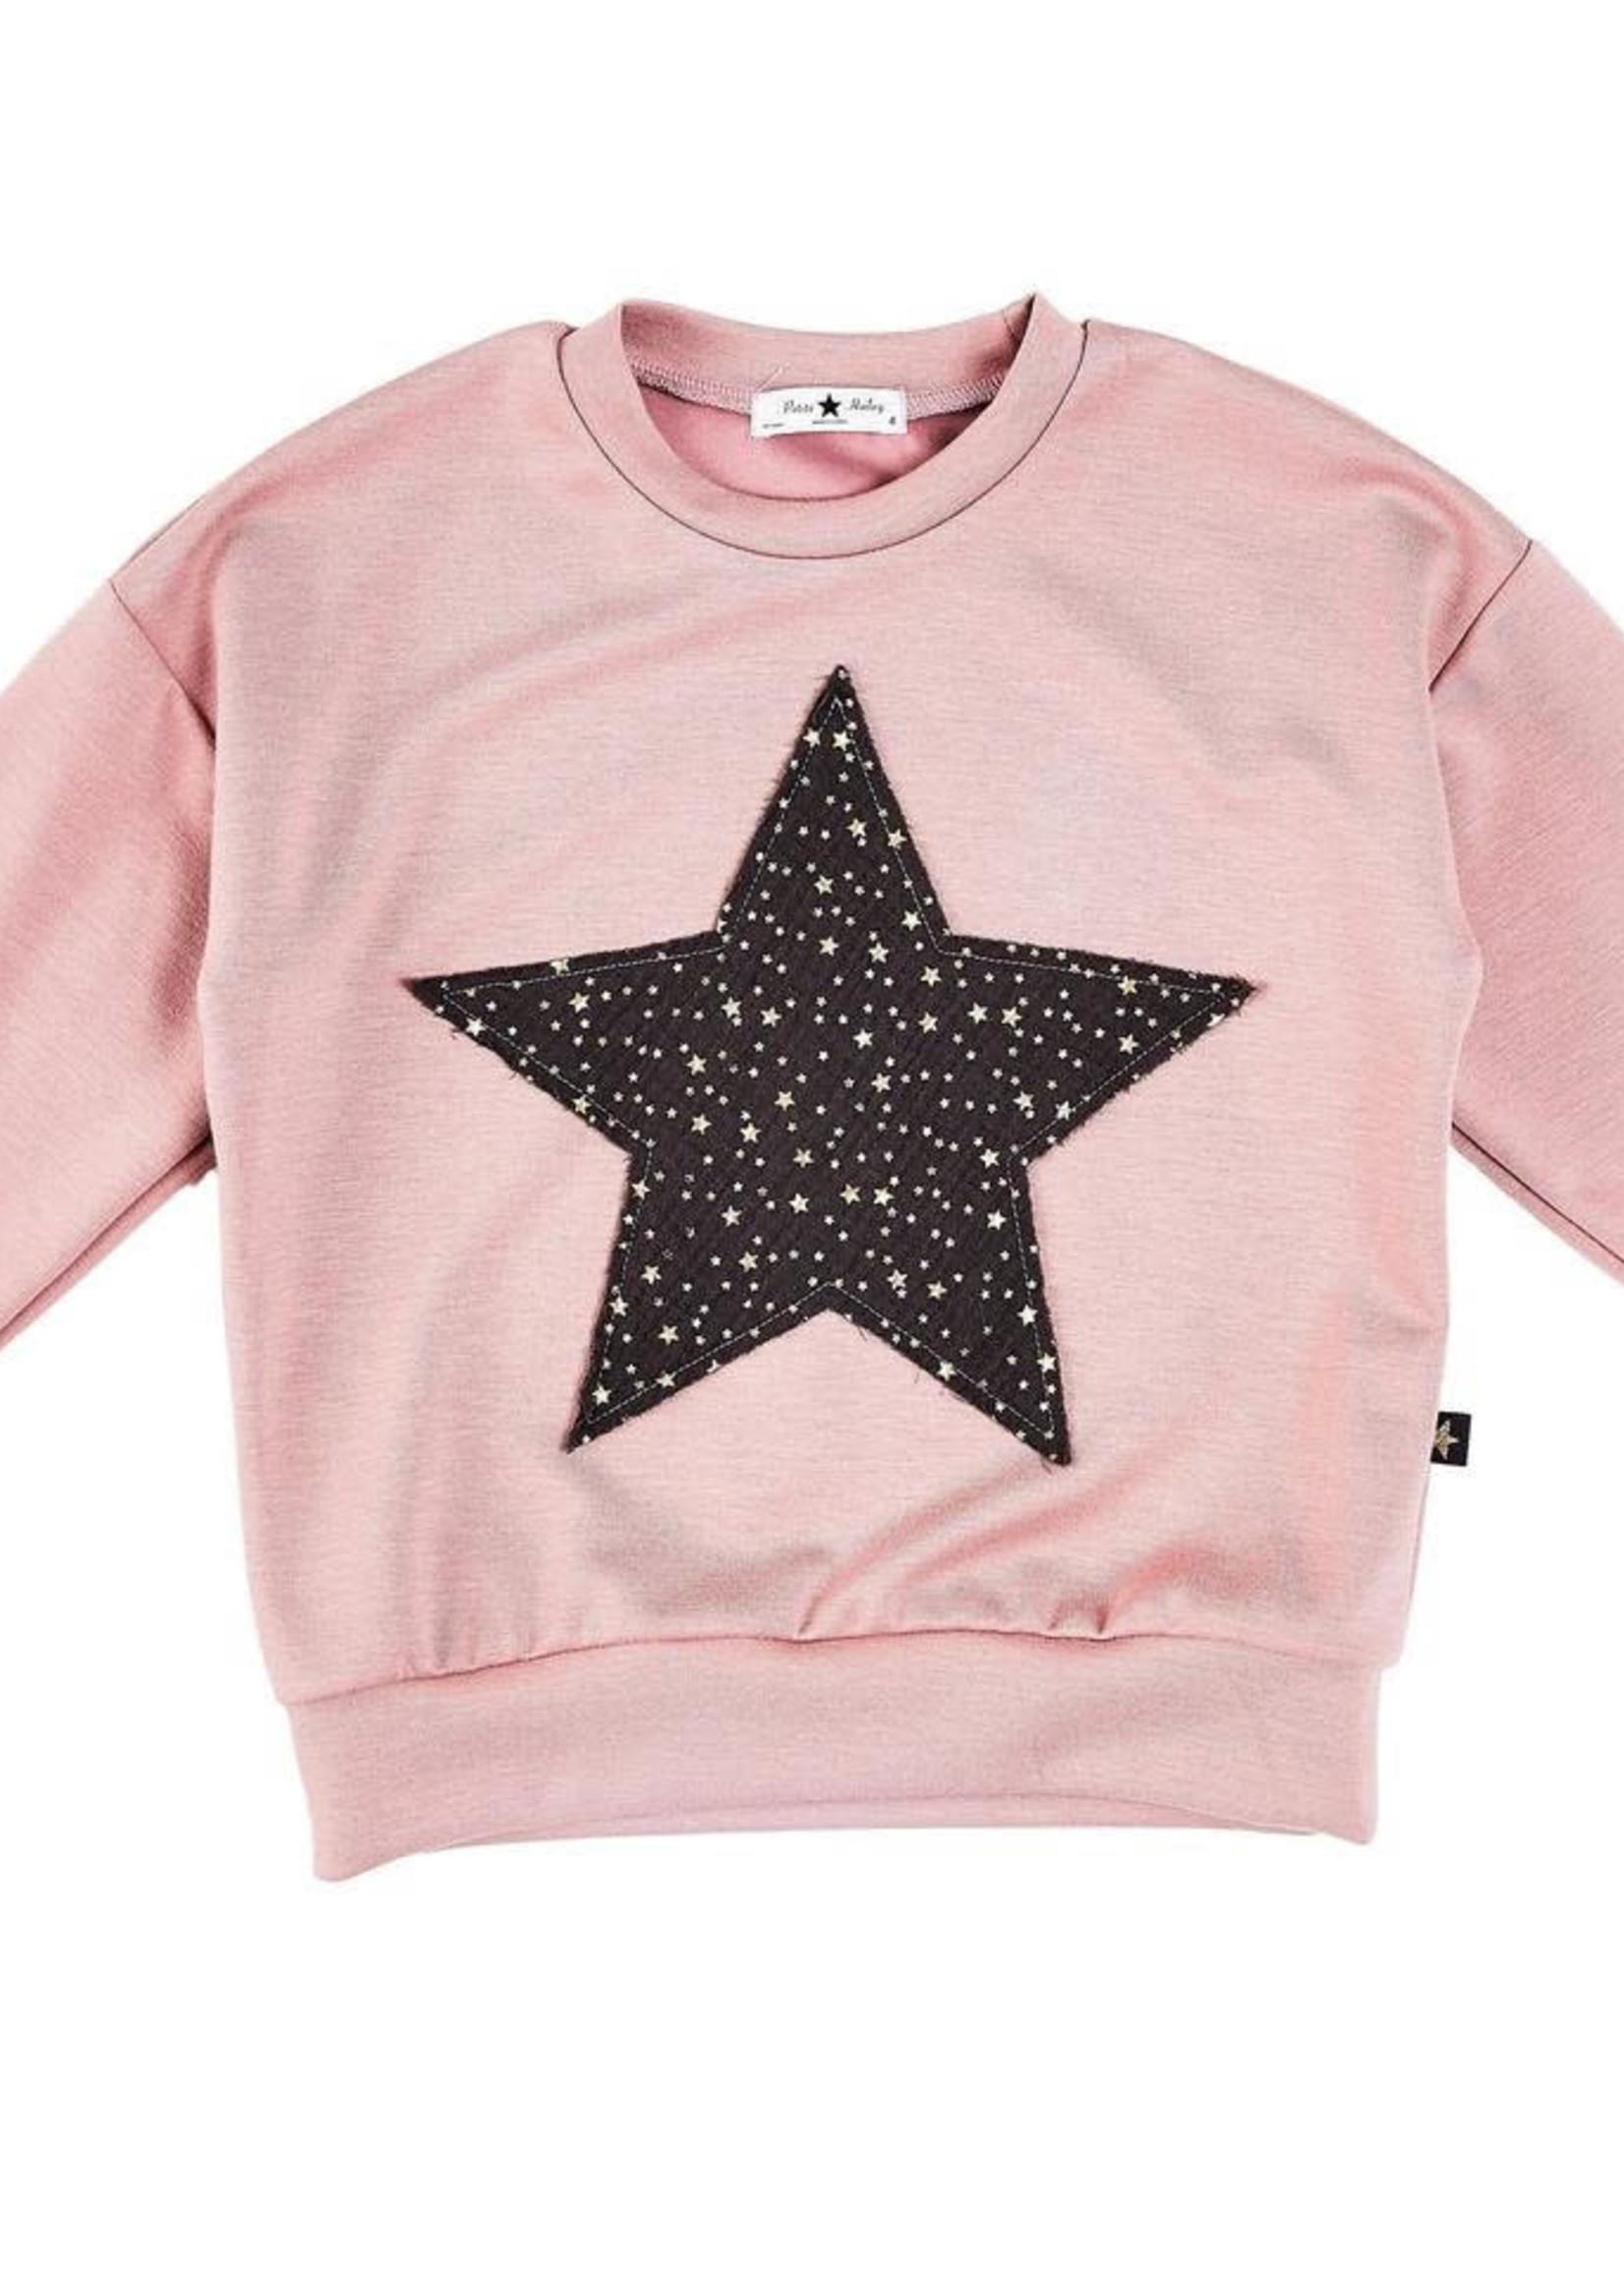 Petite Hailey PH Star Sweater (Pink)